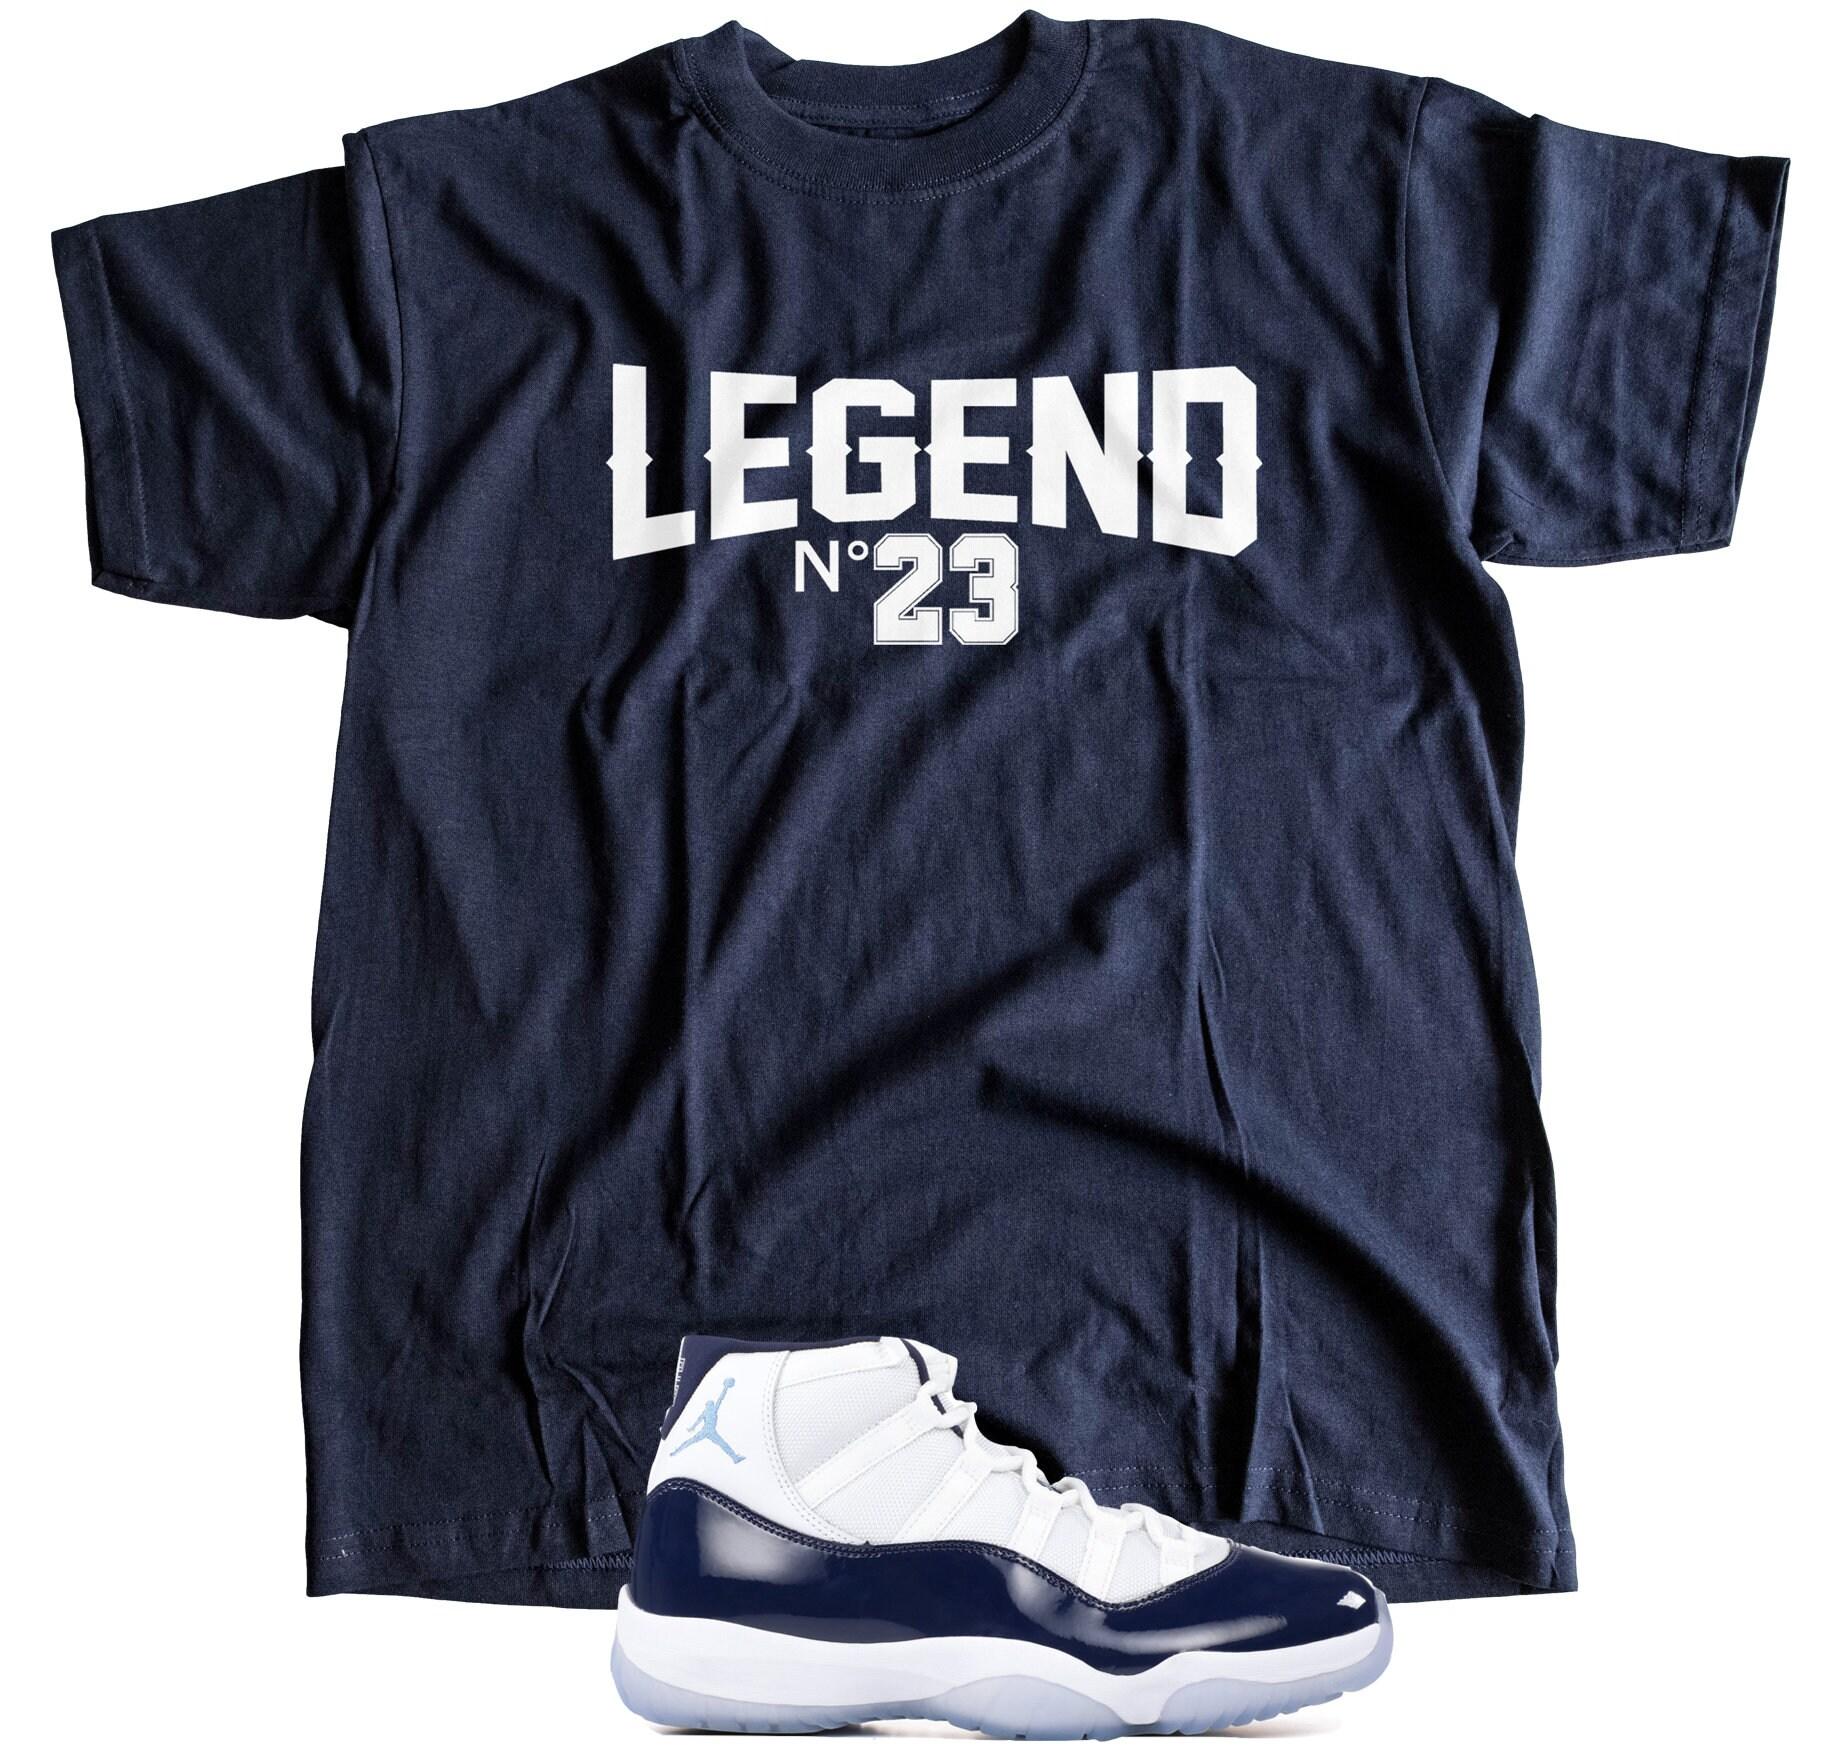 a6b2ff5291a4d9 New T-Shirt to Match Nike Air Jordan Retro 11 WIN LIKE